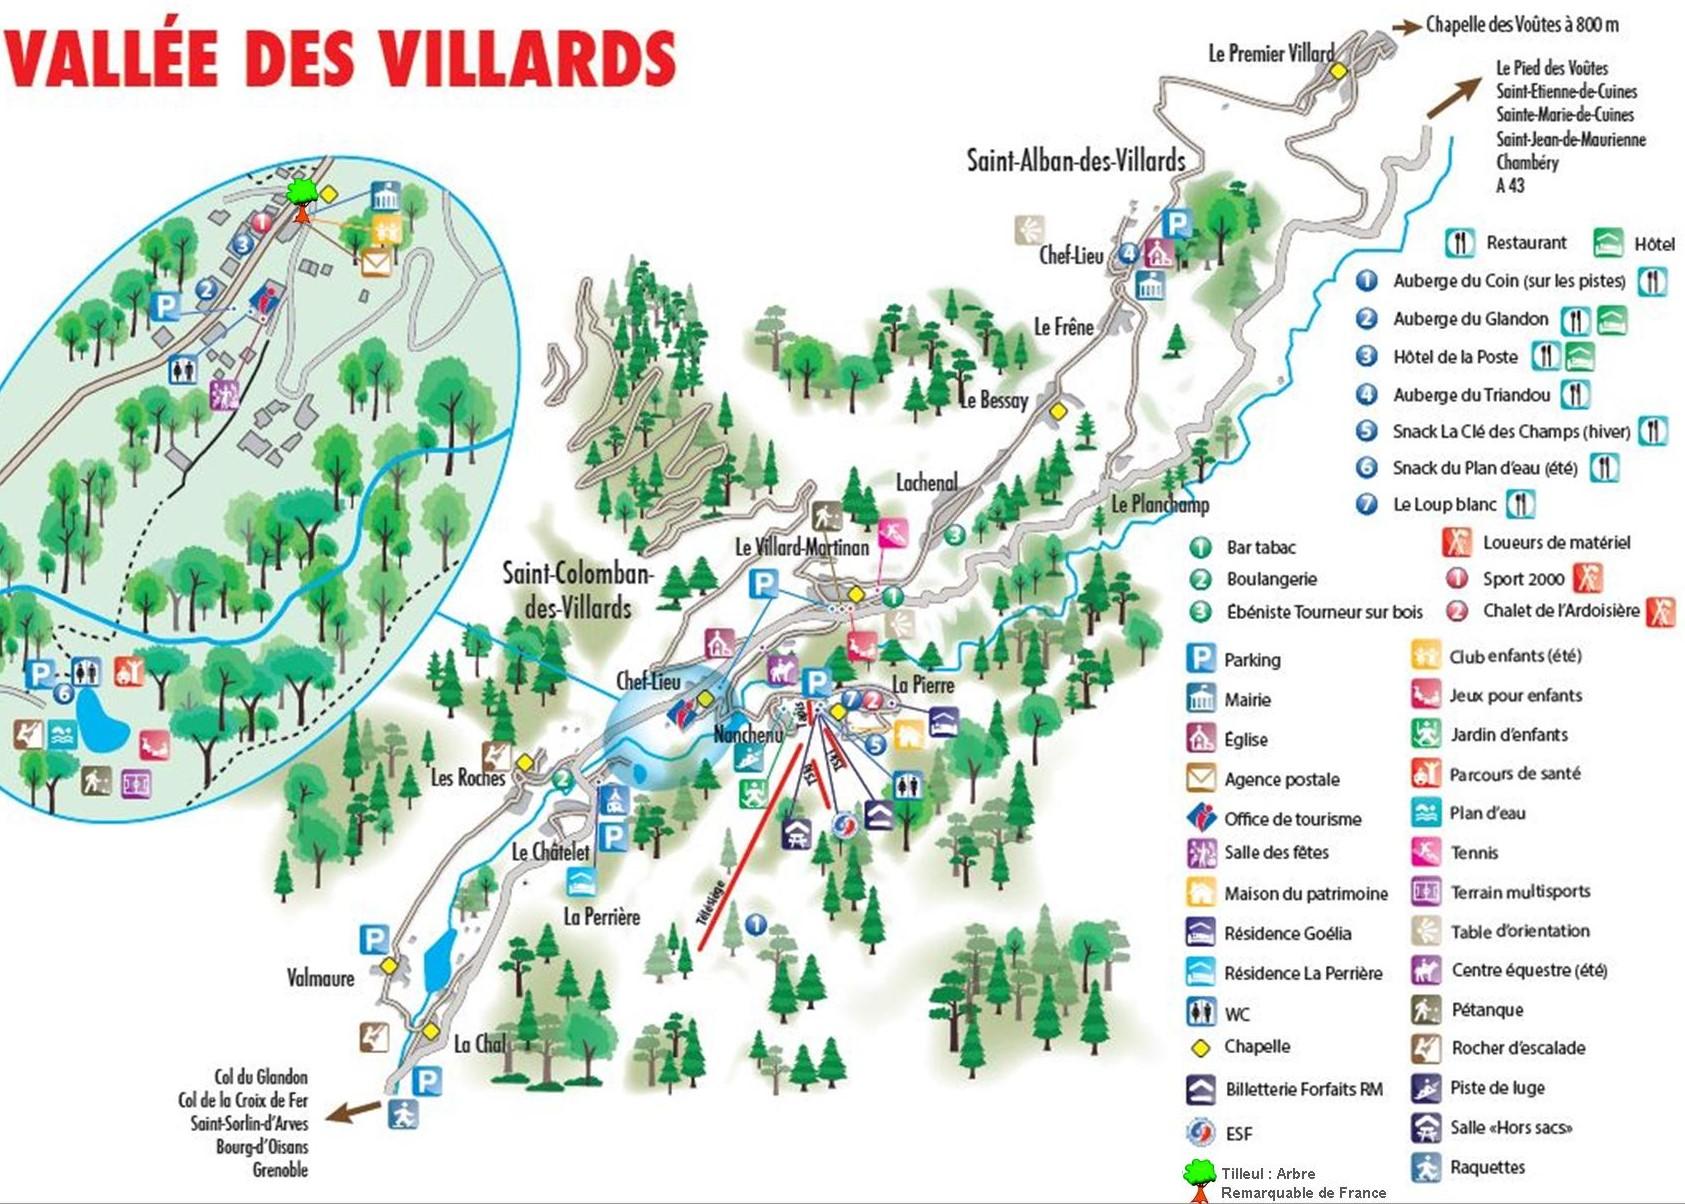 carte-touristique-vallee-des-villards-403